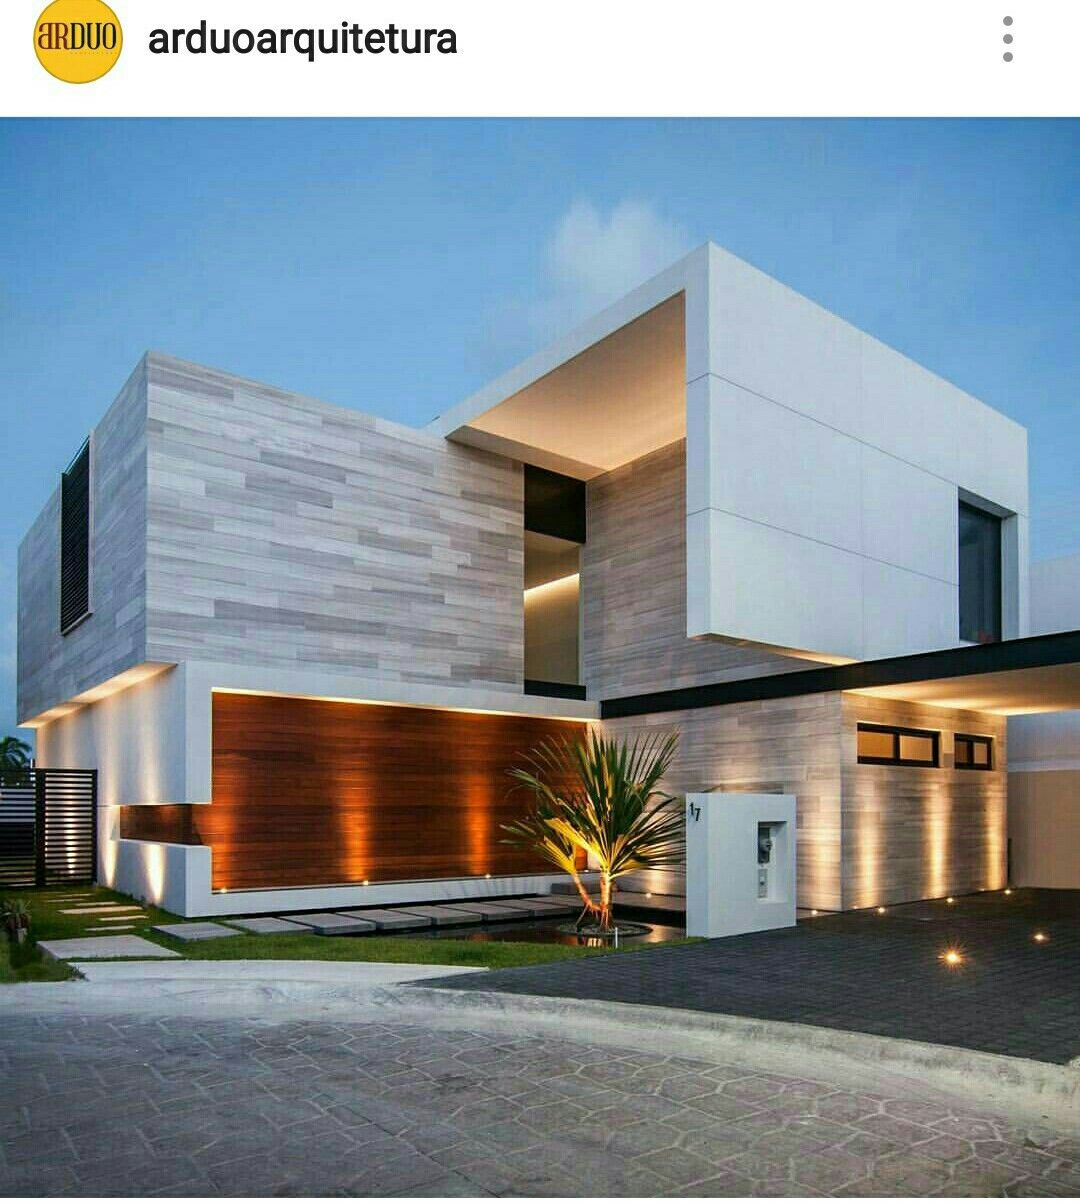 Pin von Nikoleta F. auf amazing/fantastic | Pinterest | Architektur ...